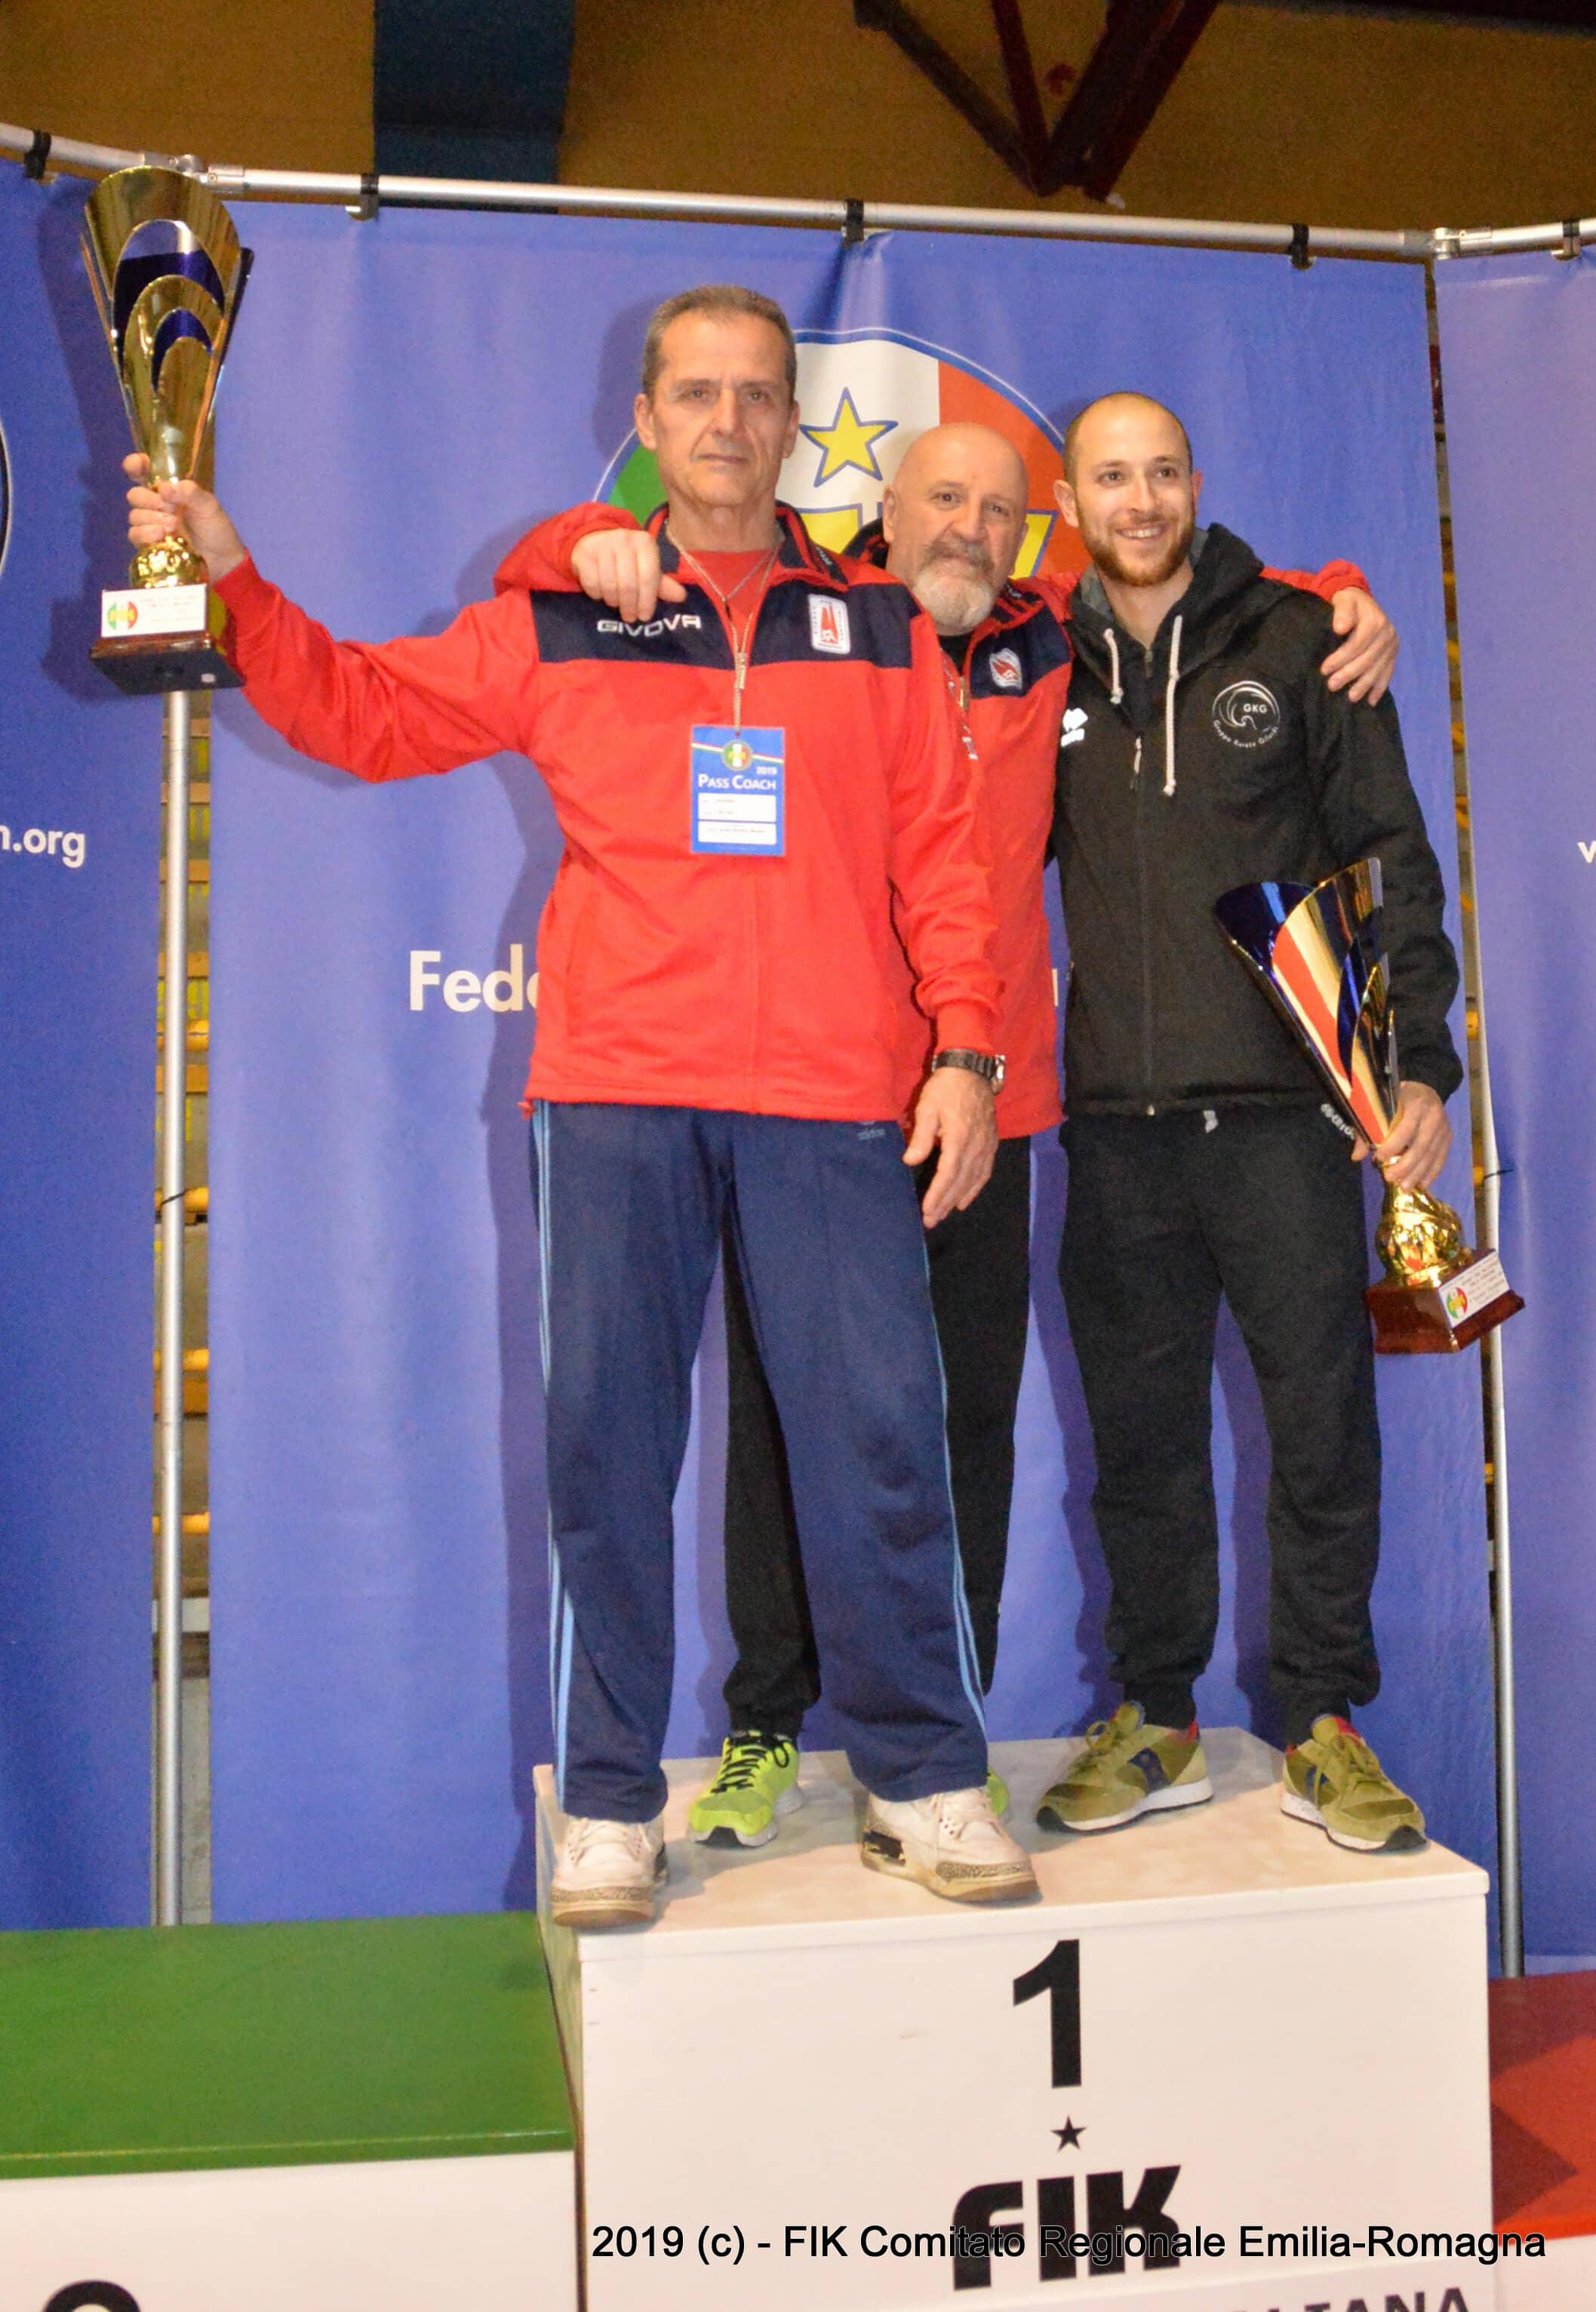 Grand Prix Nazionale d'Emilia Romagna 2019